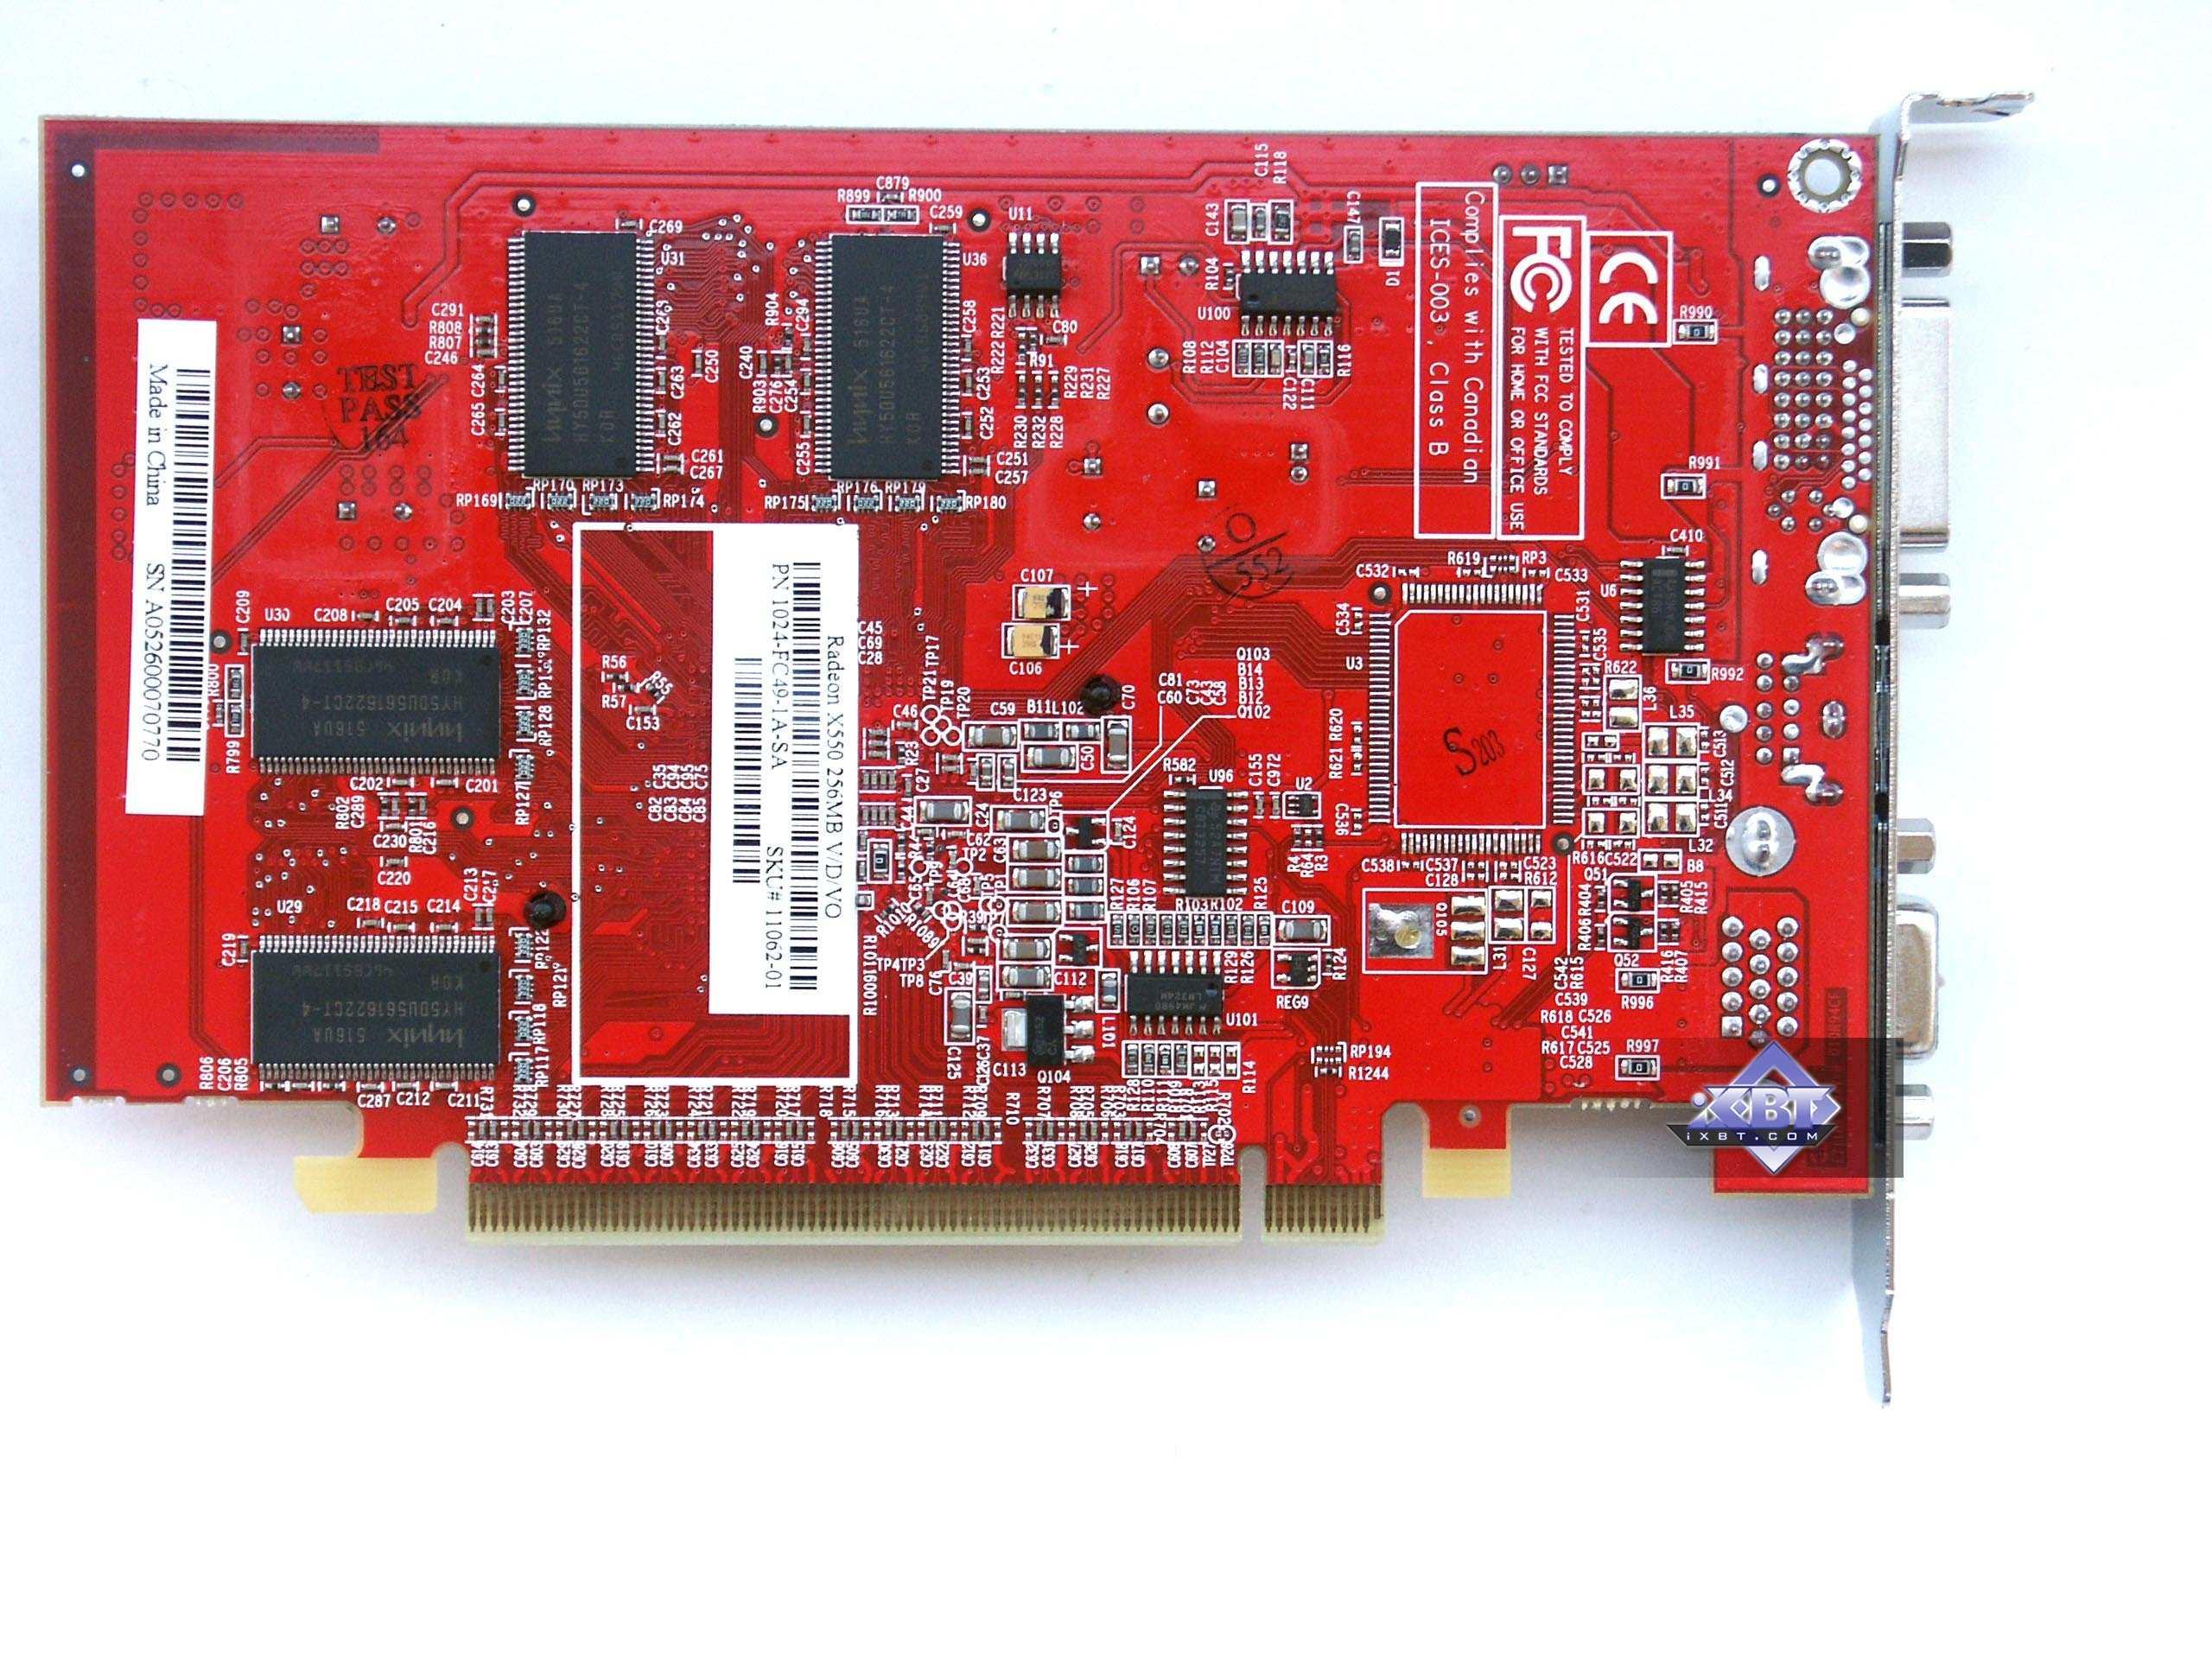 ATI RADEON X550 PCI EXPRESS WINDOWS 7 X64 DRIVER DOWNLOAD